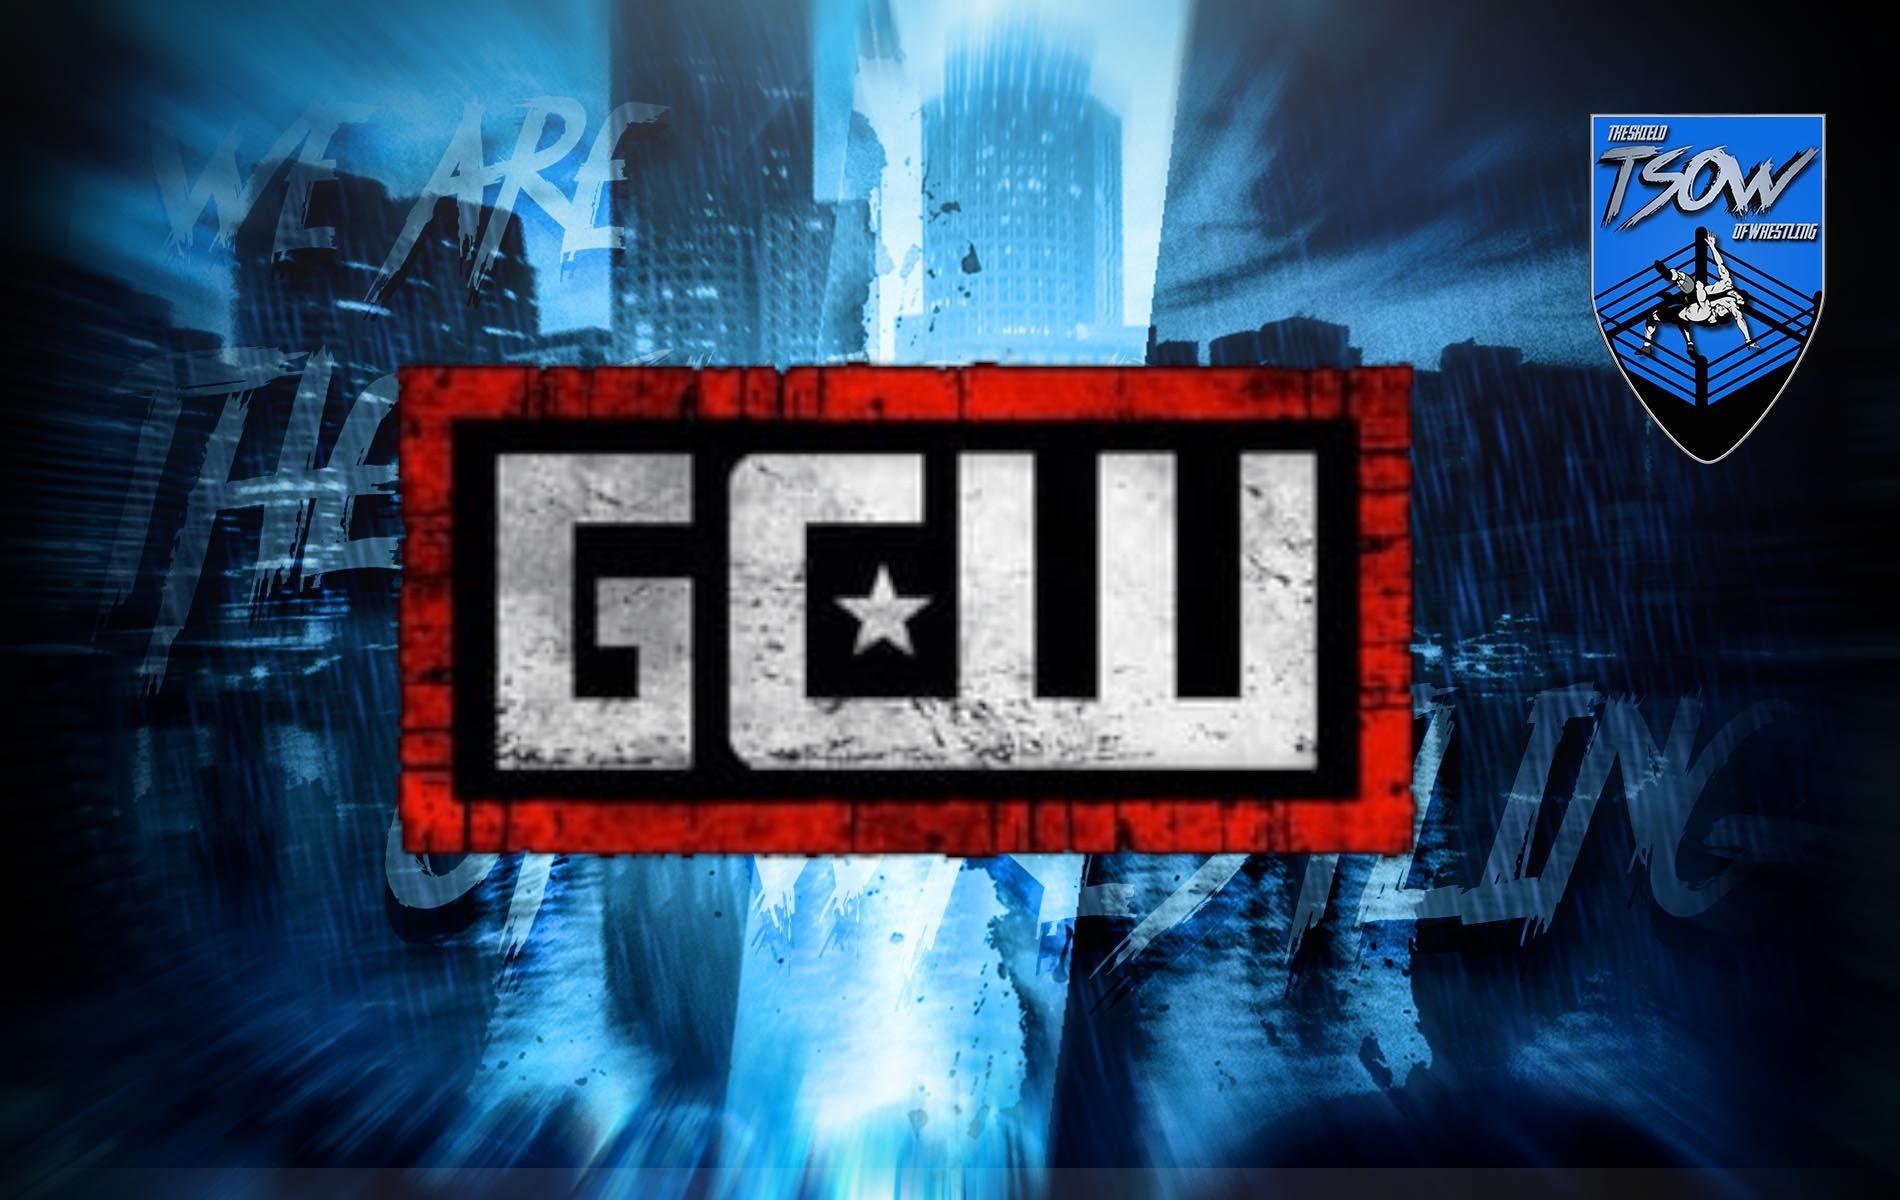 GCW: malore per un wrestler durante un match